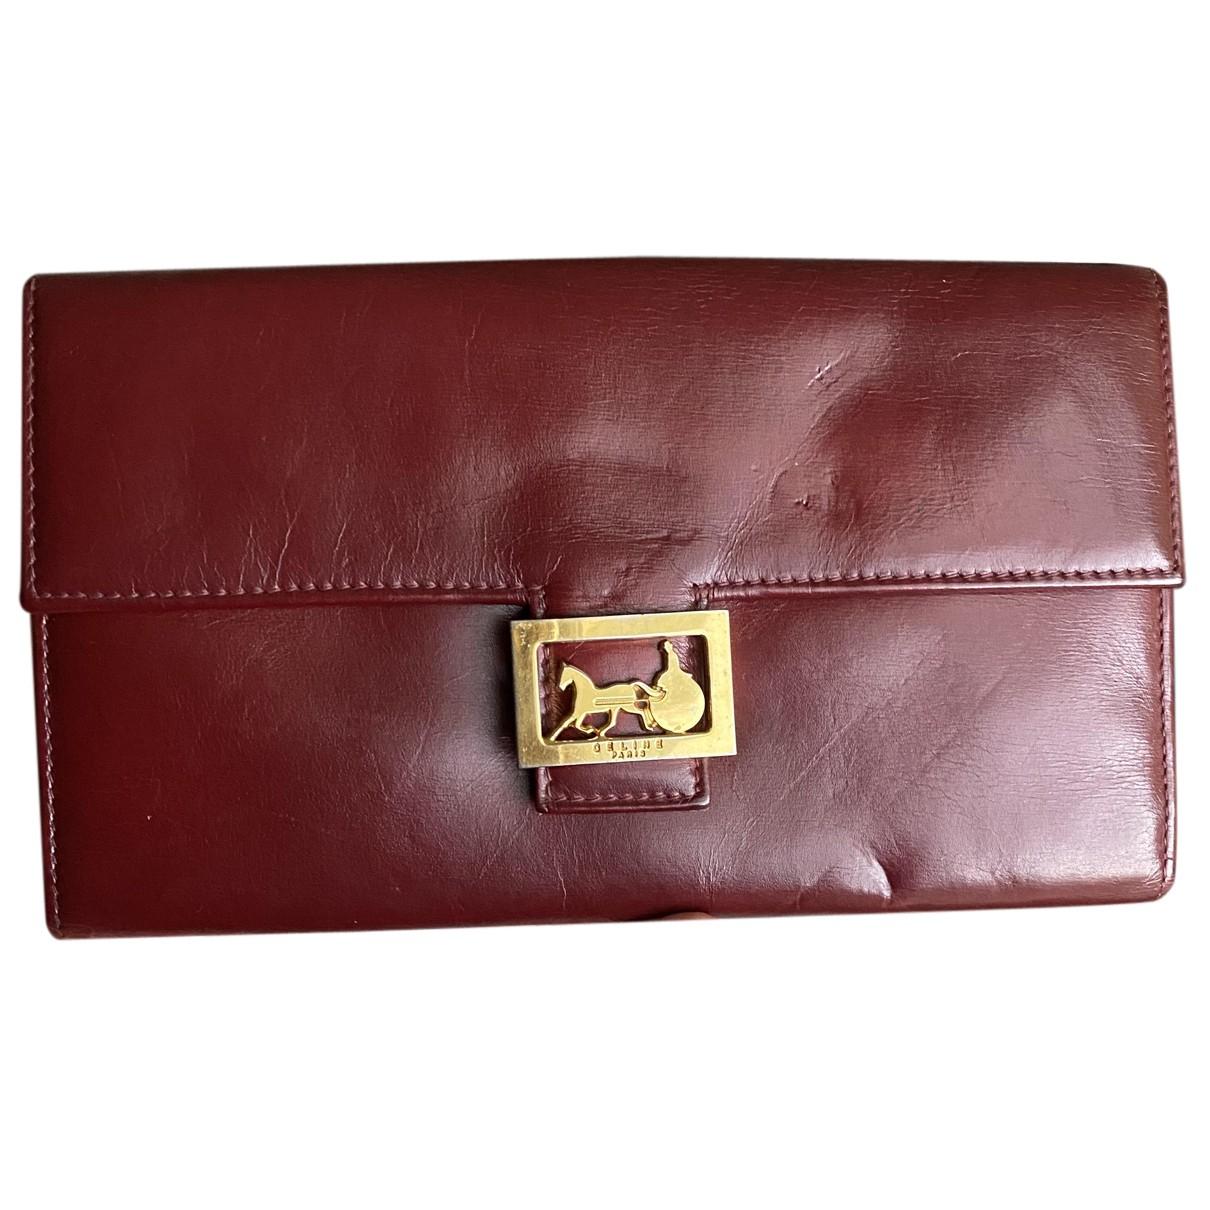 Celine N Burgundy Leather Purses, wallet & cases for Women N